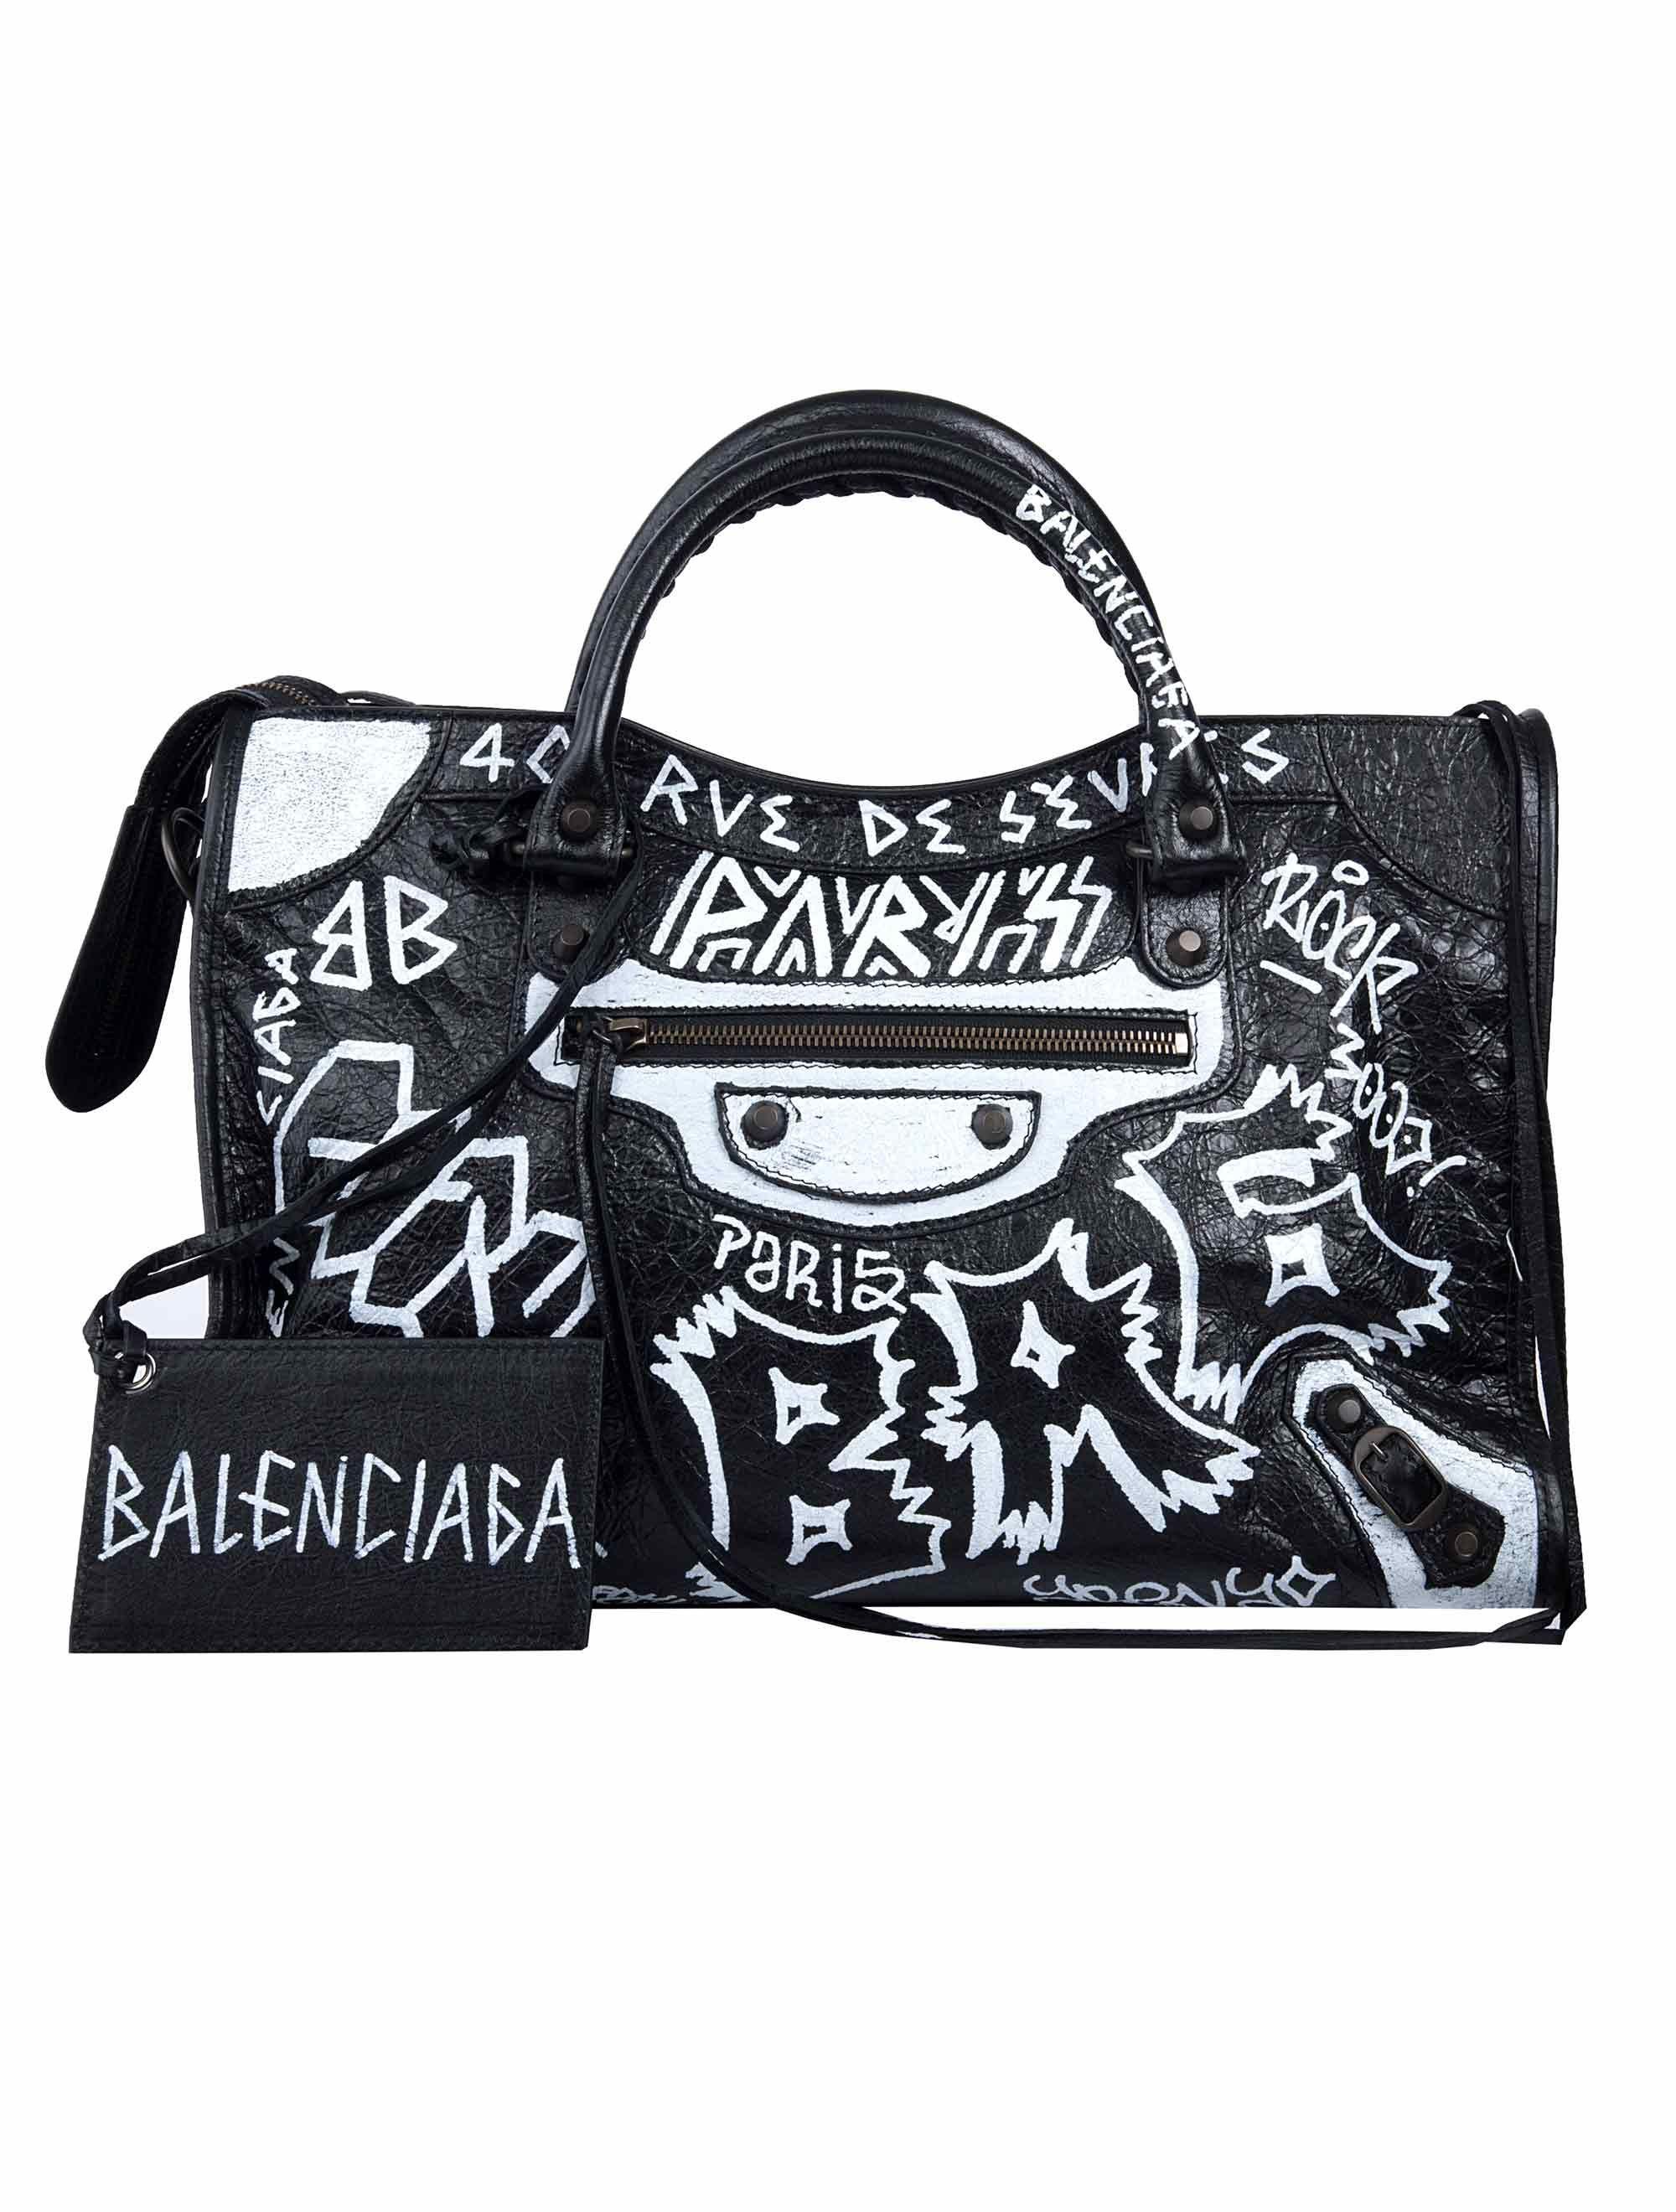 d455fe6389 Balenciaga Classic City Aj Graffiti-Print Satchel Bag In Black ...